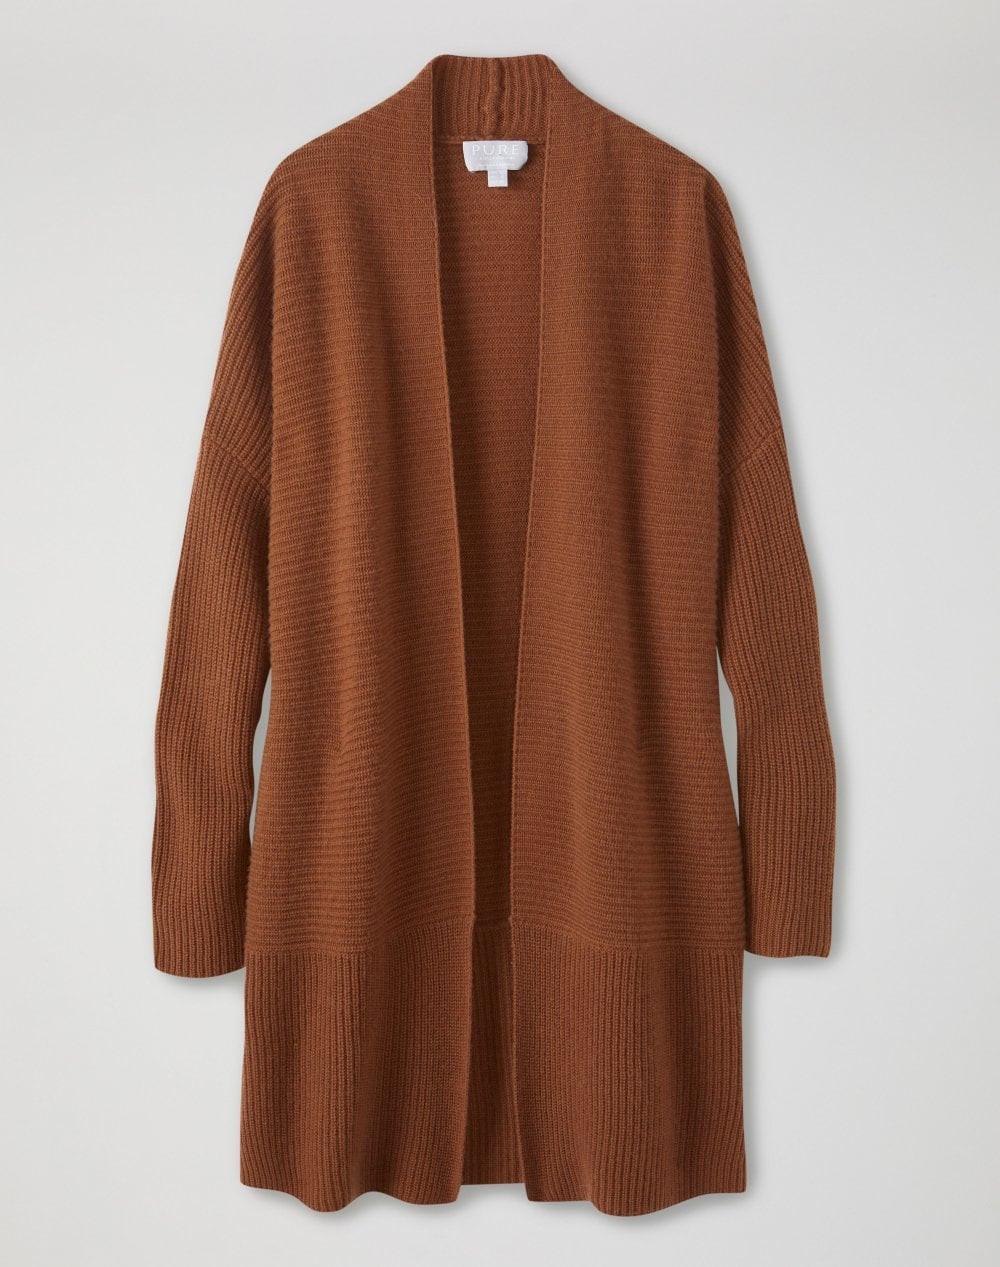 Pure Collection Lofty cognac cashmere cardigan